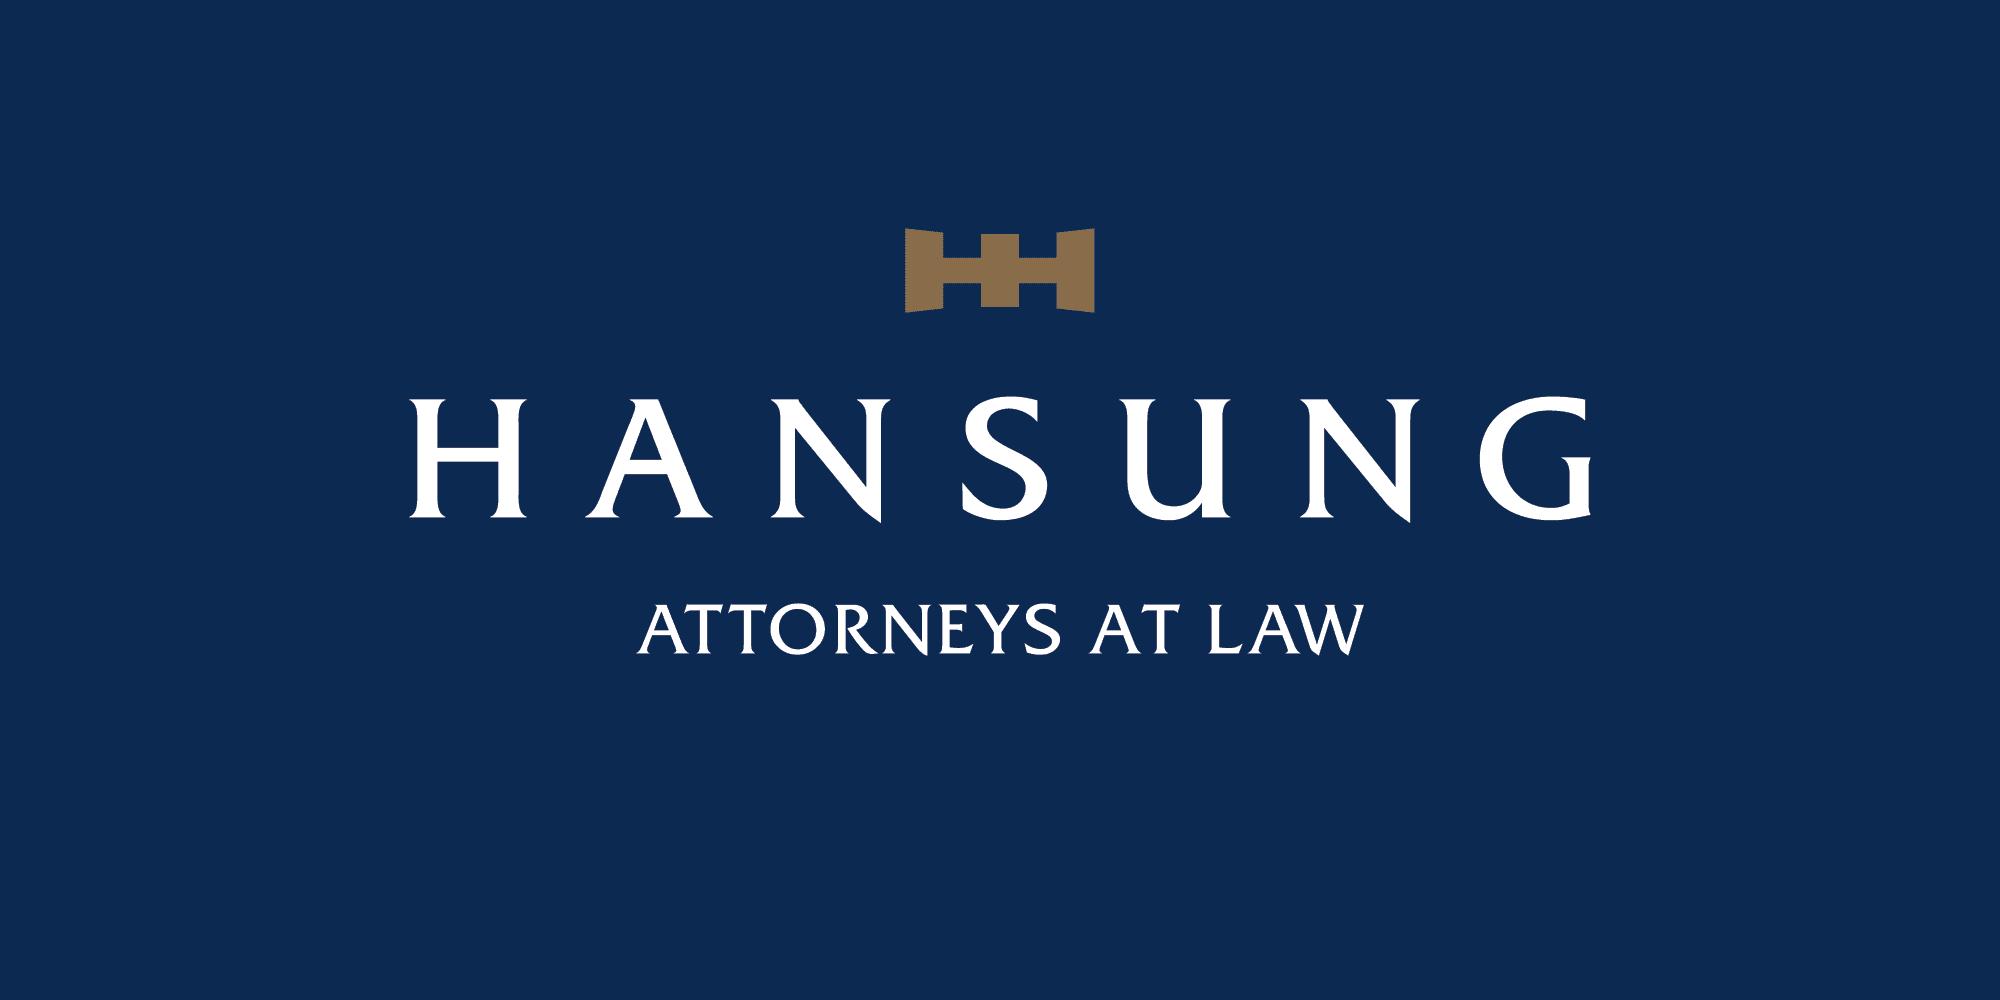 Hansung Attorneys At Law